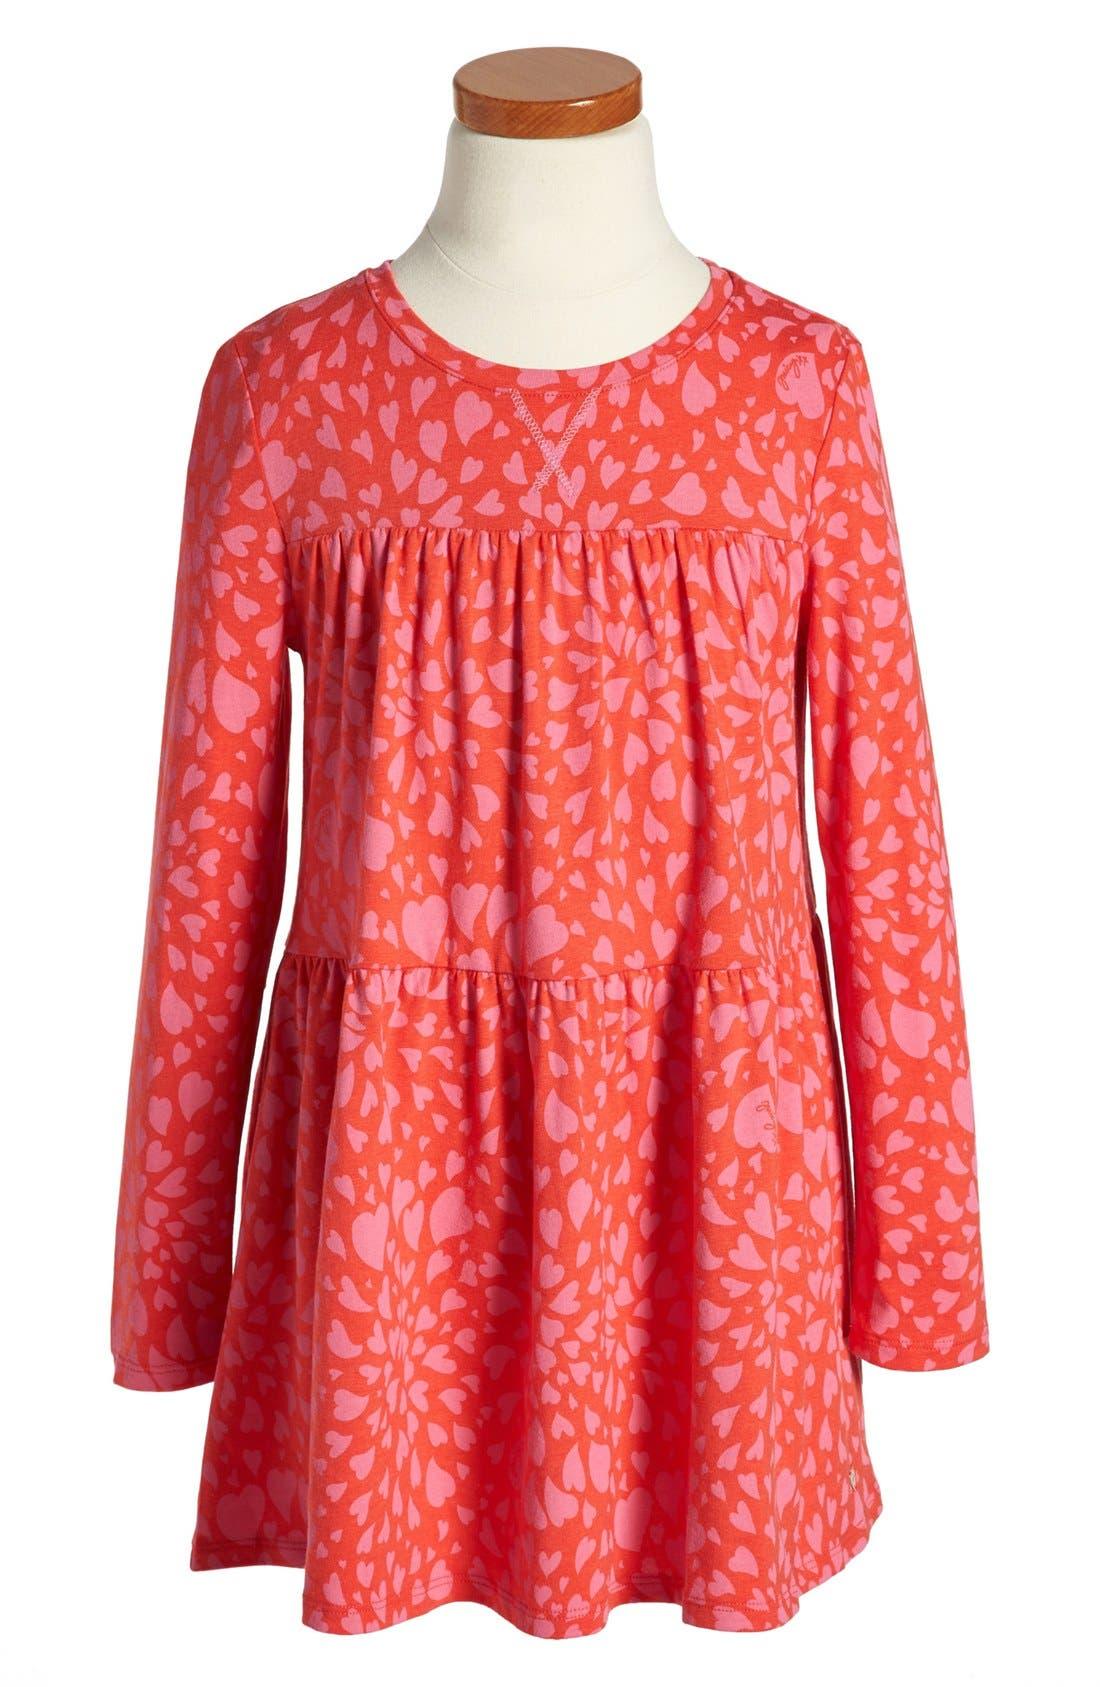 Main Image - Juicy Couture 'Heart Swirl' Knit Dress (Toddler Girls, Little Girls & Big Girls)